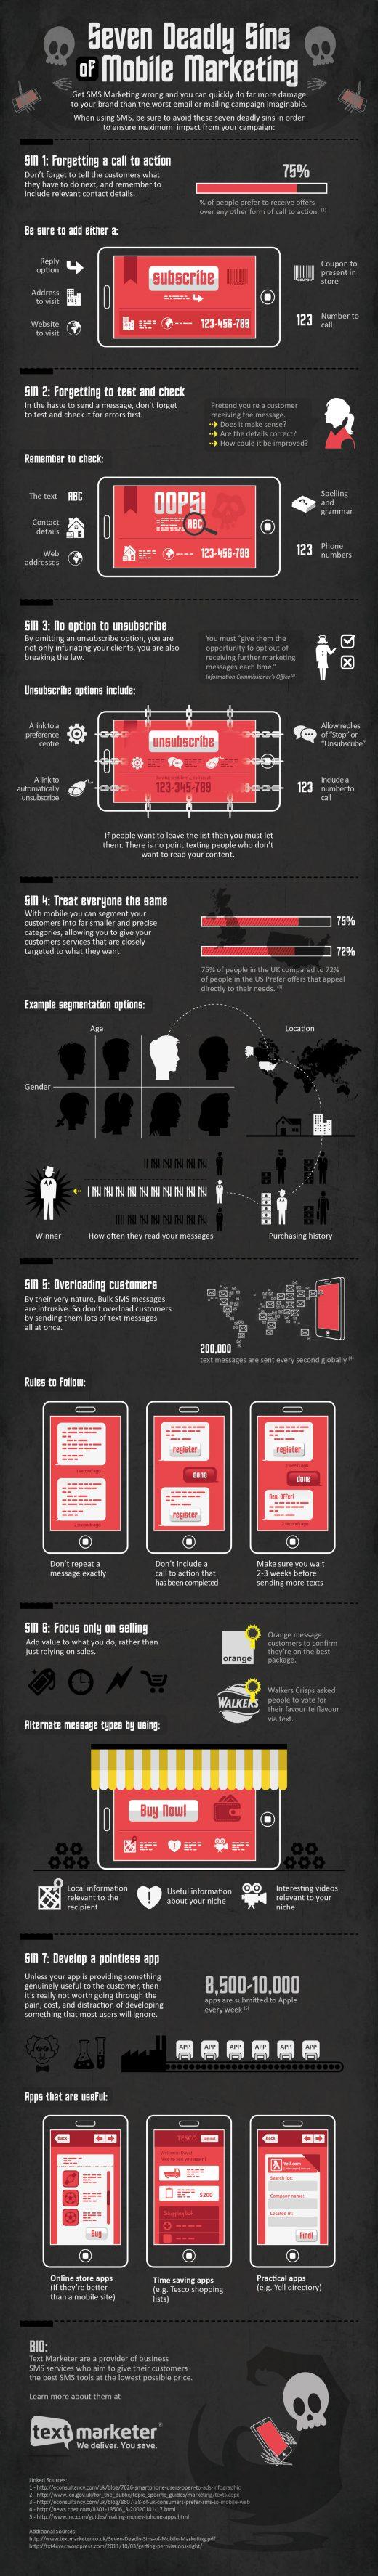 Todsünden mobile Marketing